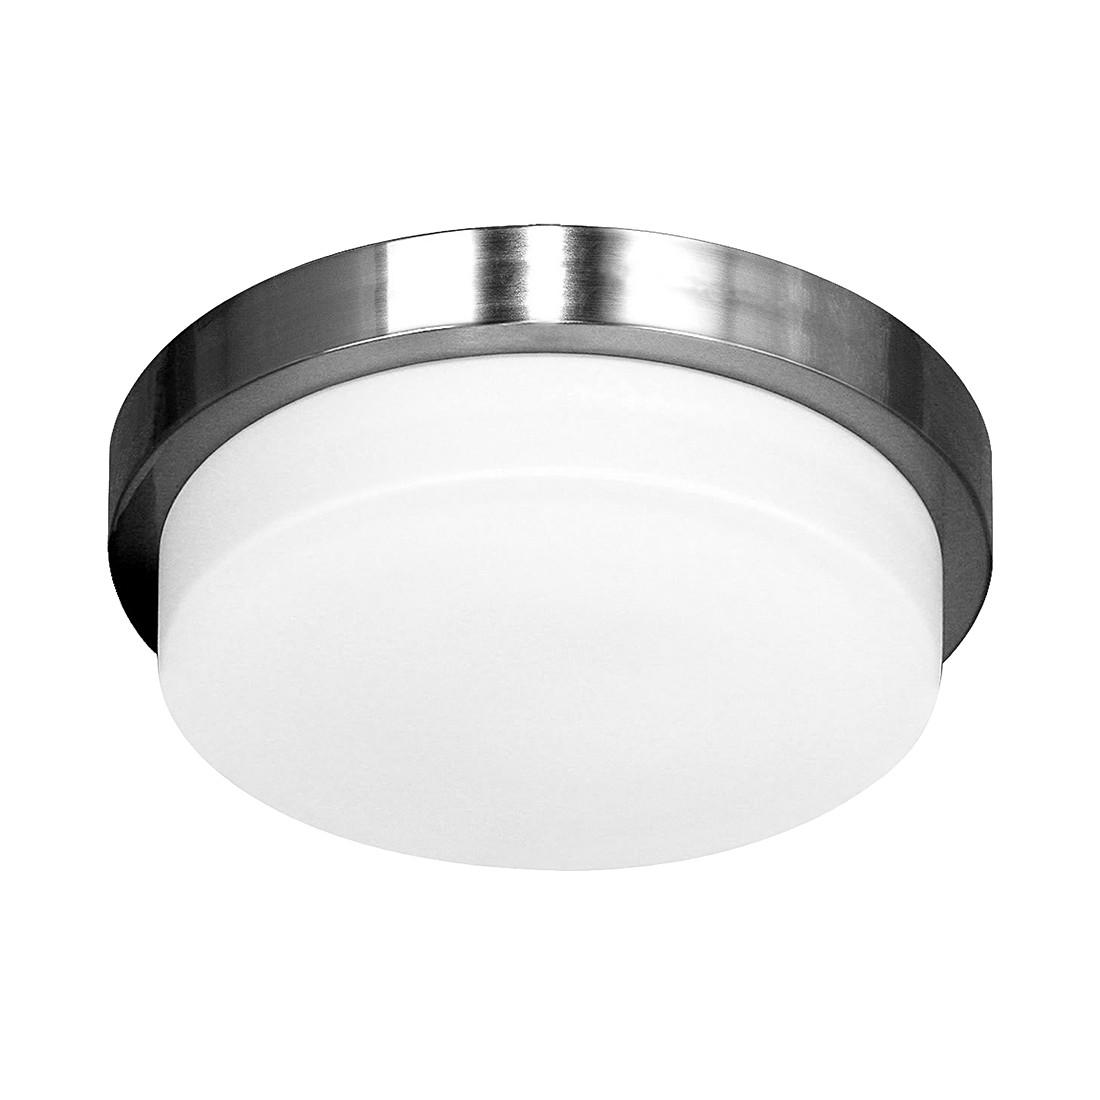 Deckenleuchte Press – 3-Flammig Ø30 – Aluminium, Opalglas Nickel-Satin, Weiß-Matt, s`luce online bestellen